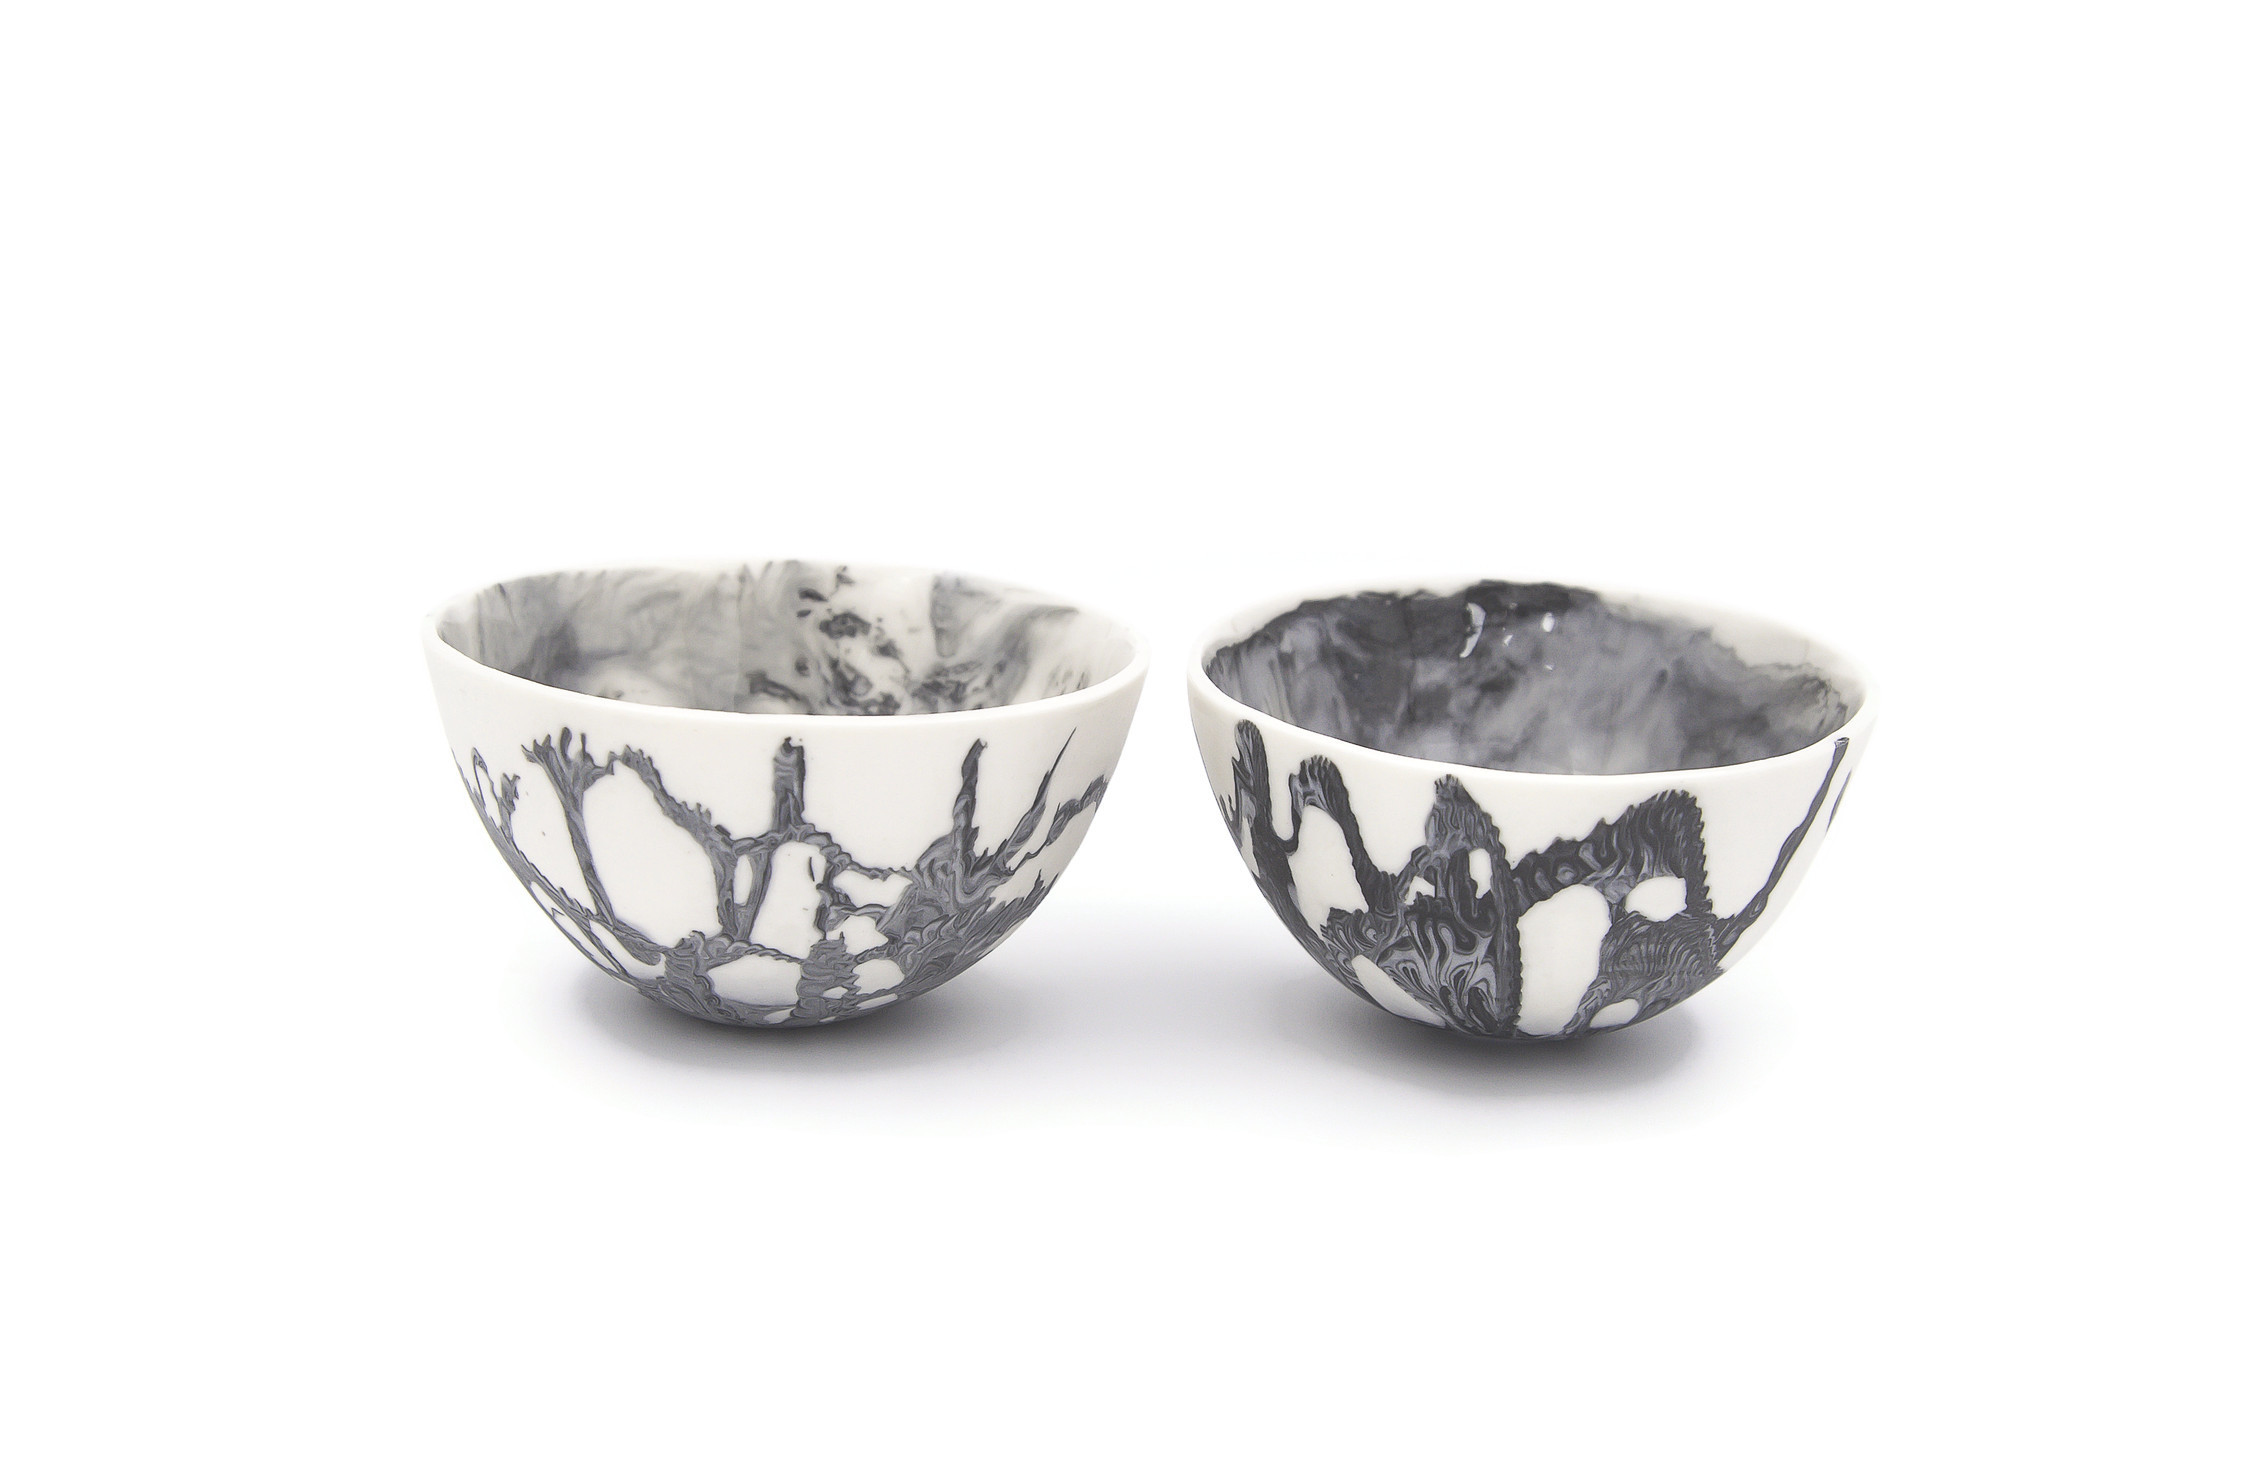 Ceramic Bowl, Marble Bowl, Porcelain Bowl, Premium Ceramics, Condiment Bowl, Oil and Balsamic Bowl, Mezze Bowl, Tapas Bowl